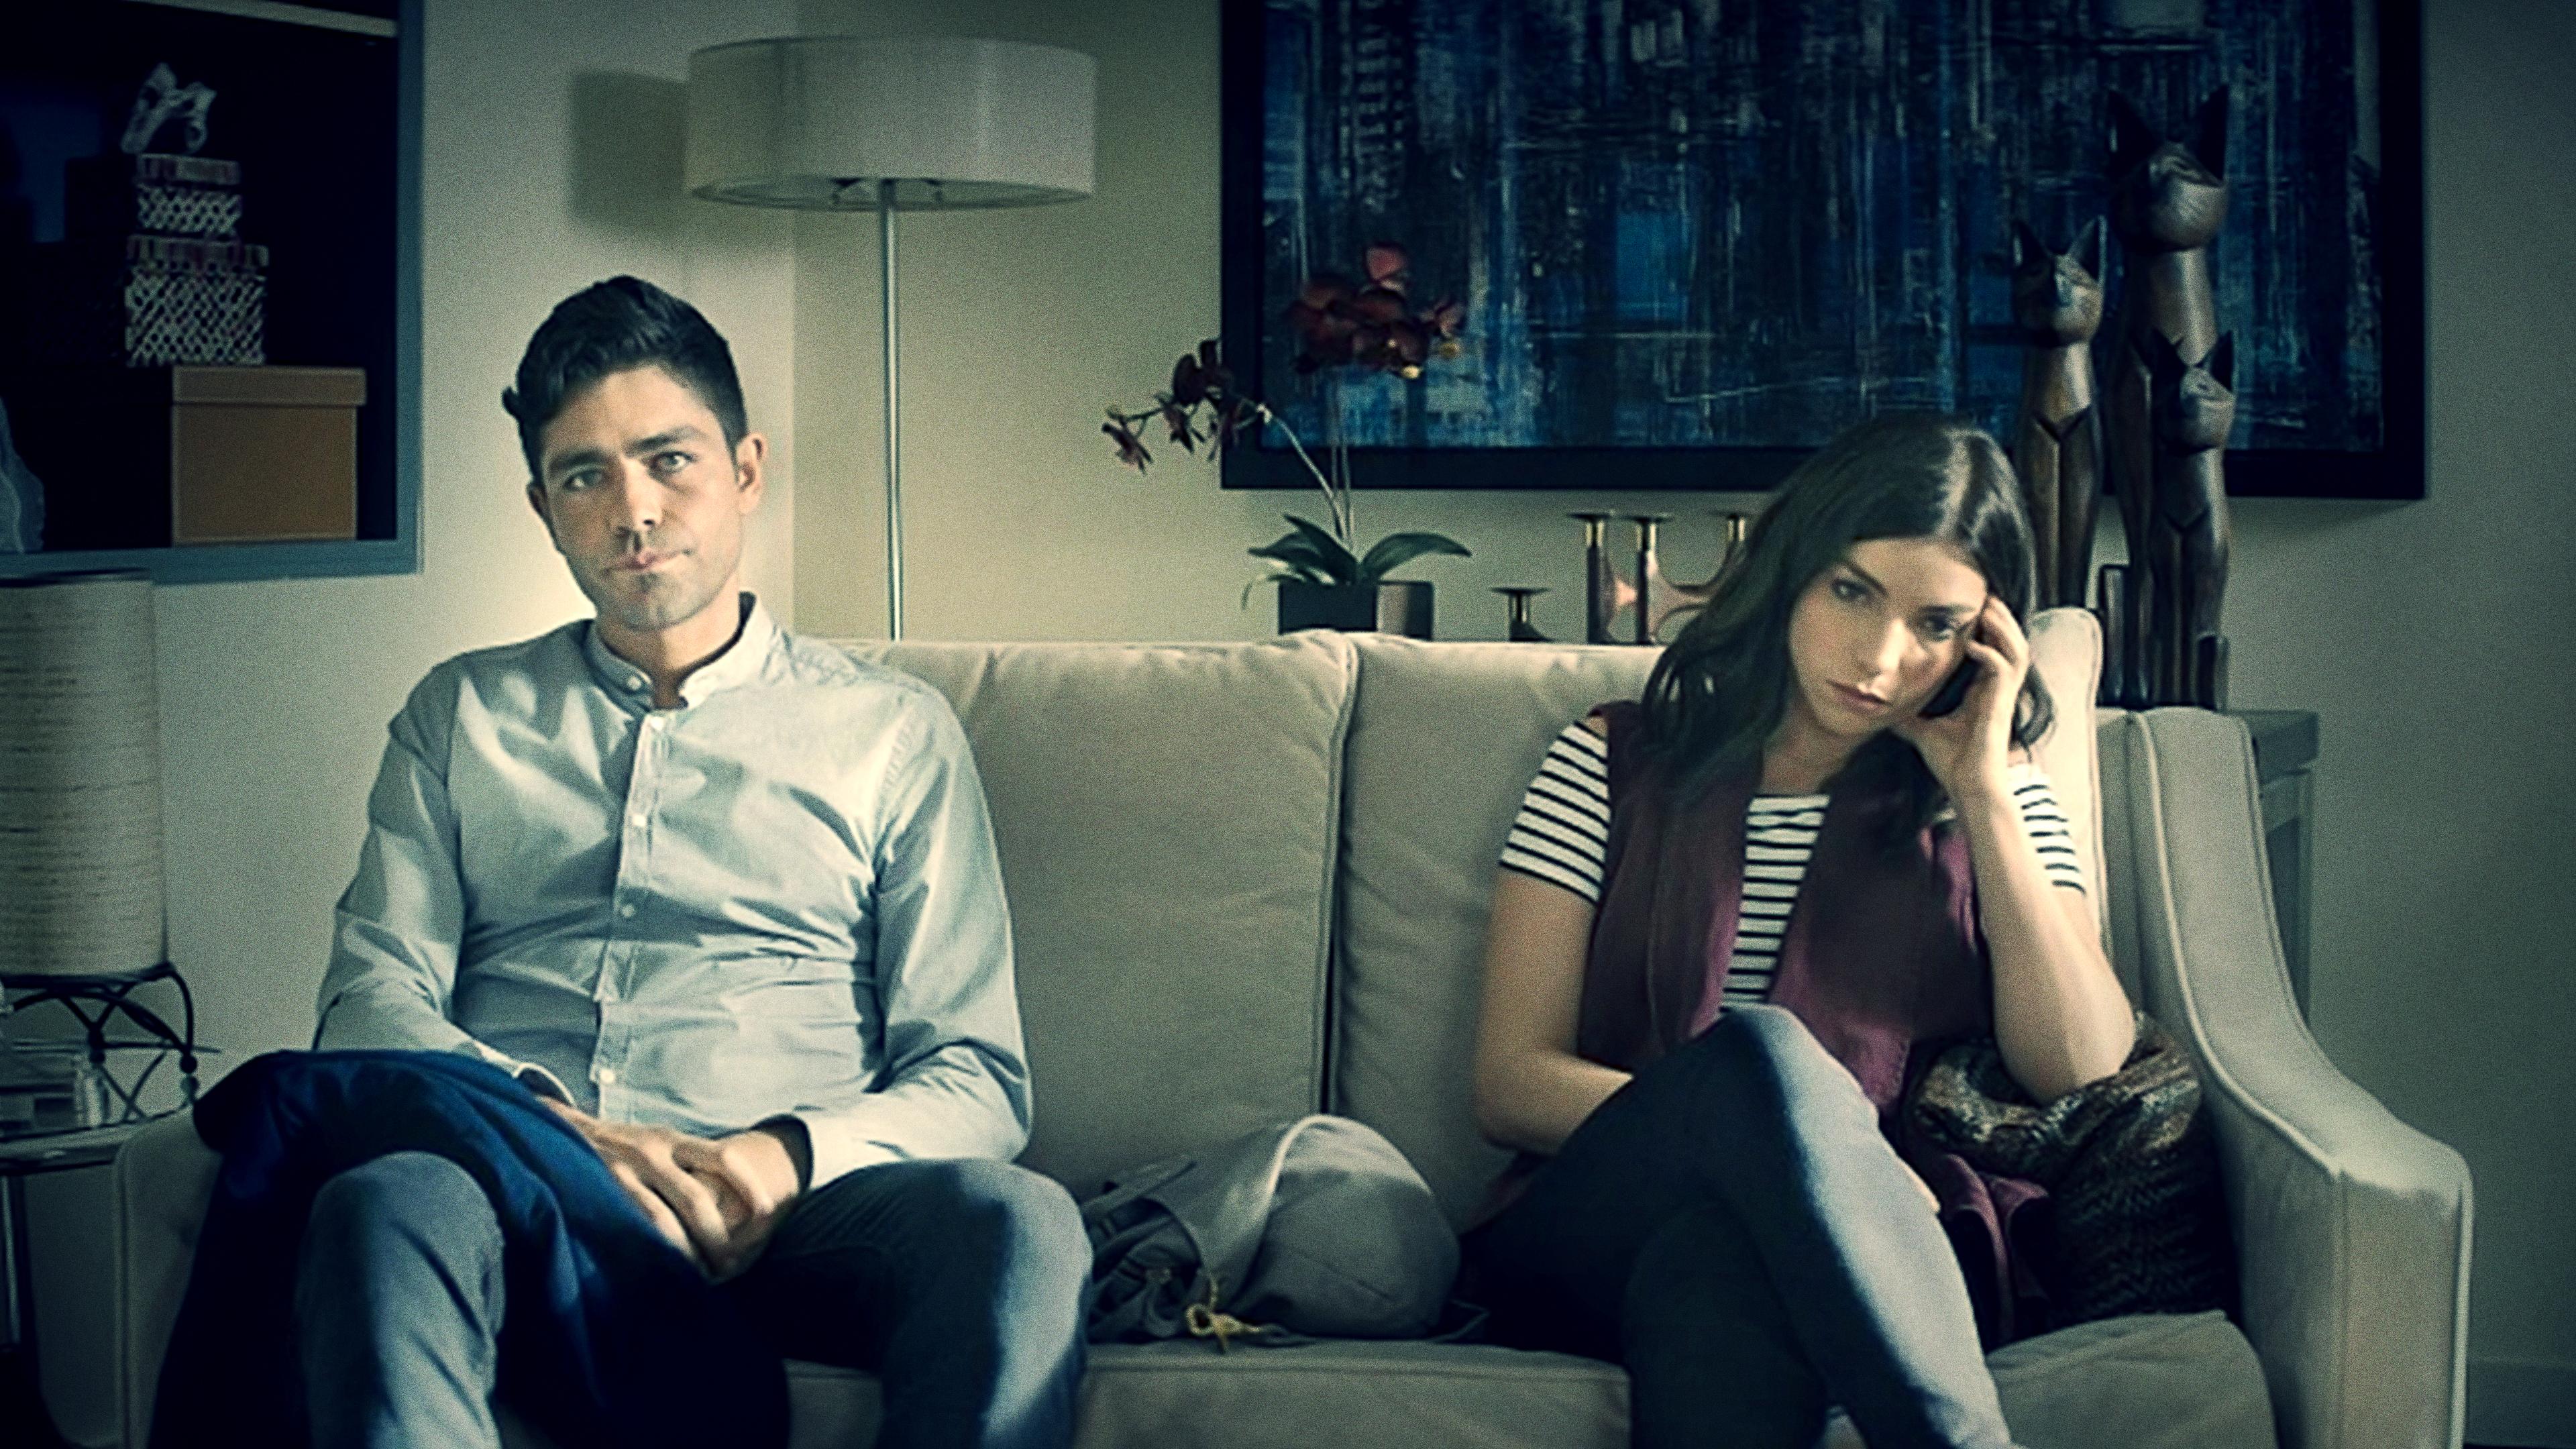 couch-still-close_adrian-grenier-angela-trimbur-in-trash-fire_courtesy-vertical-entertainment